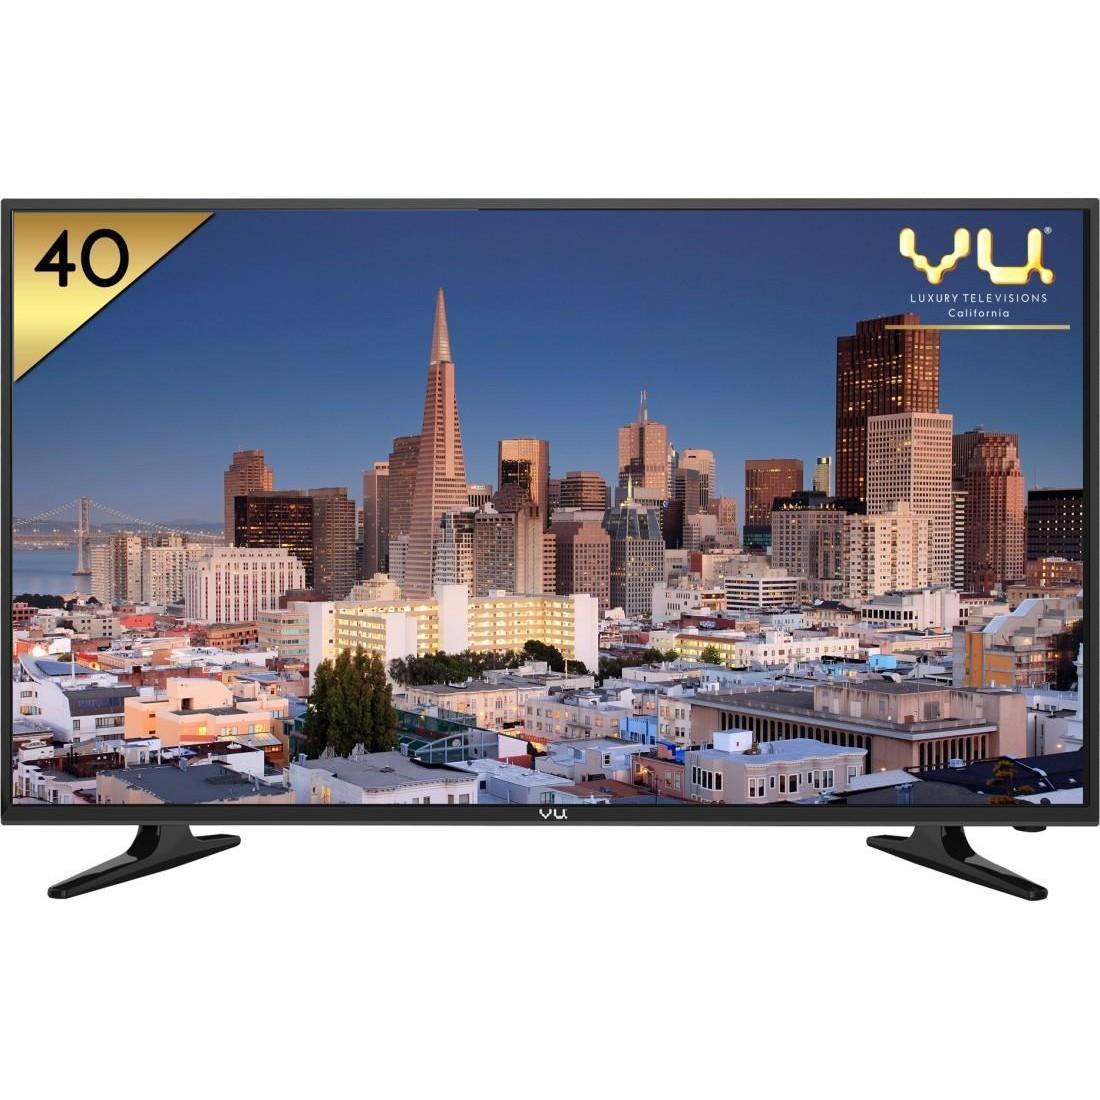 Vu 40D6575 102 cm (40) LED TV (Full HD) Image